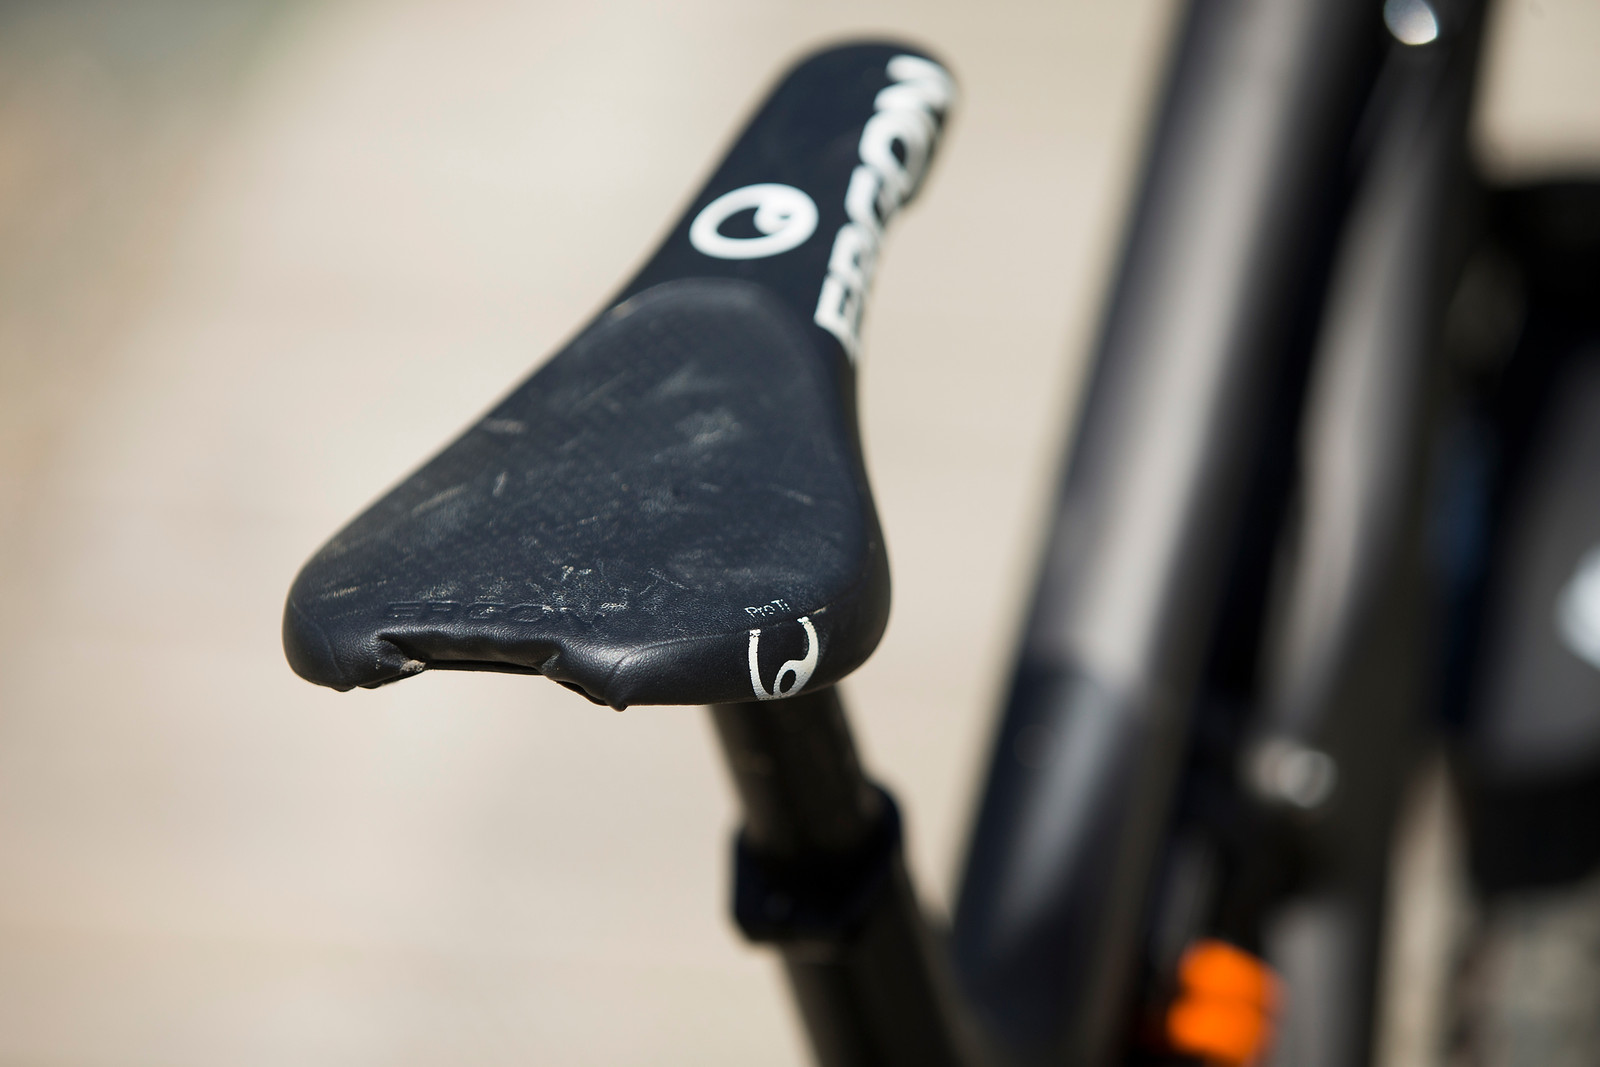 Ergon SMD2 DH Saddle - WINNING BIKE: Tahnee Seagrave's Prototype Transition - Mountain Biking Pictures - Vital MTB